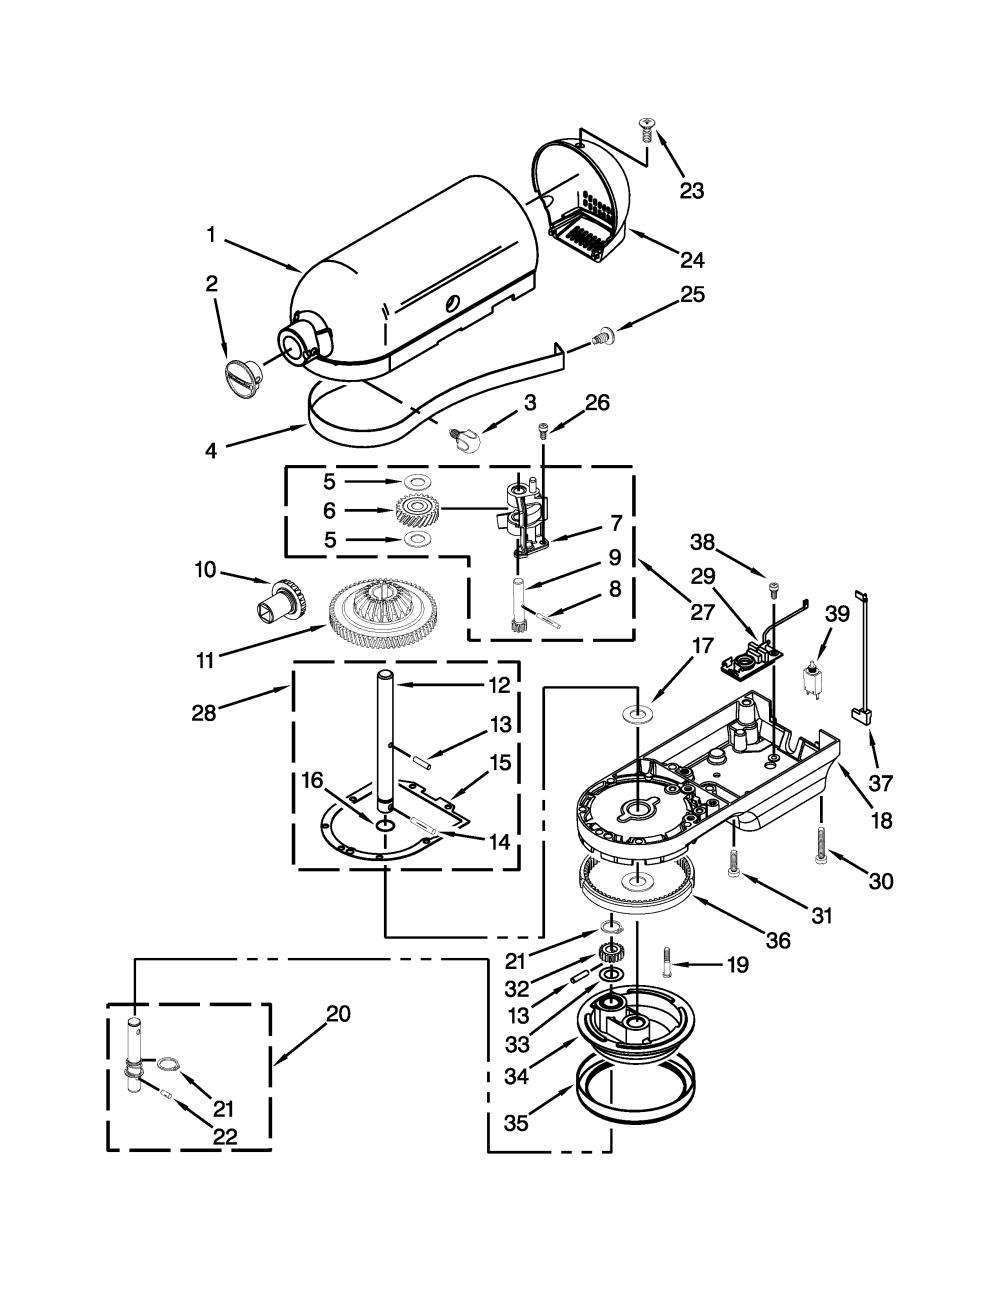 medium resolution of kitchenaid mixer wiring diagram 1 wiring diagram source 240voutletwiringdiagram new 220 volt 30 amp switch bundadaffa